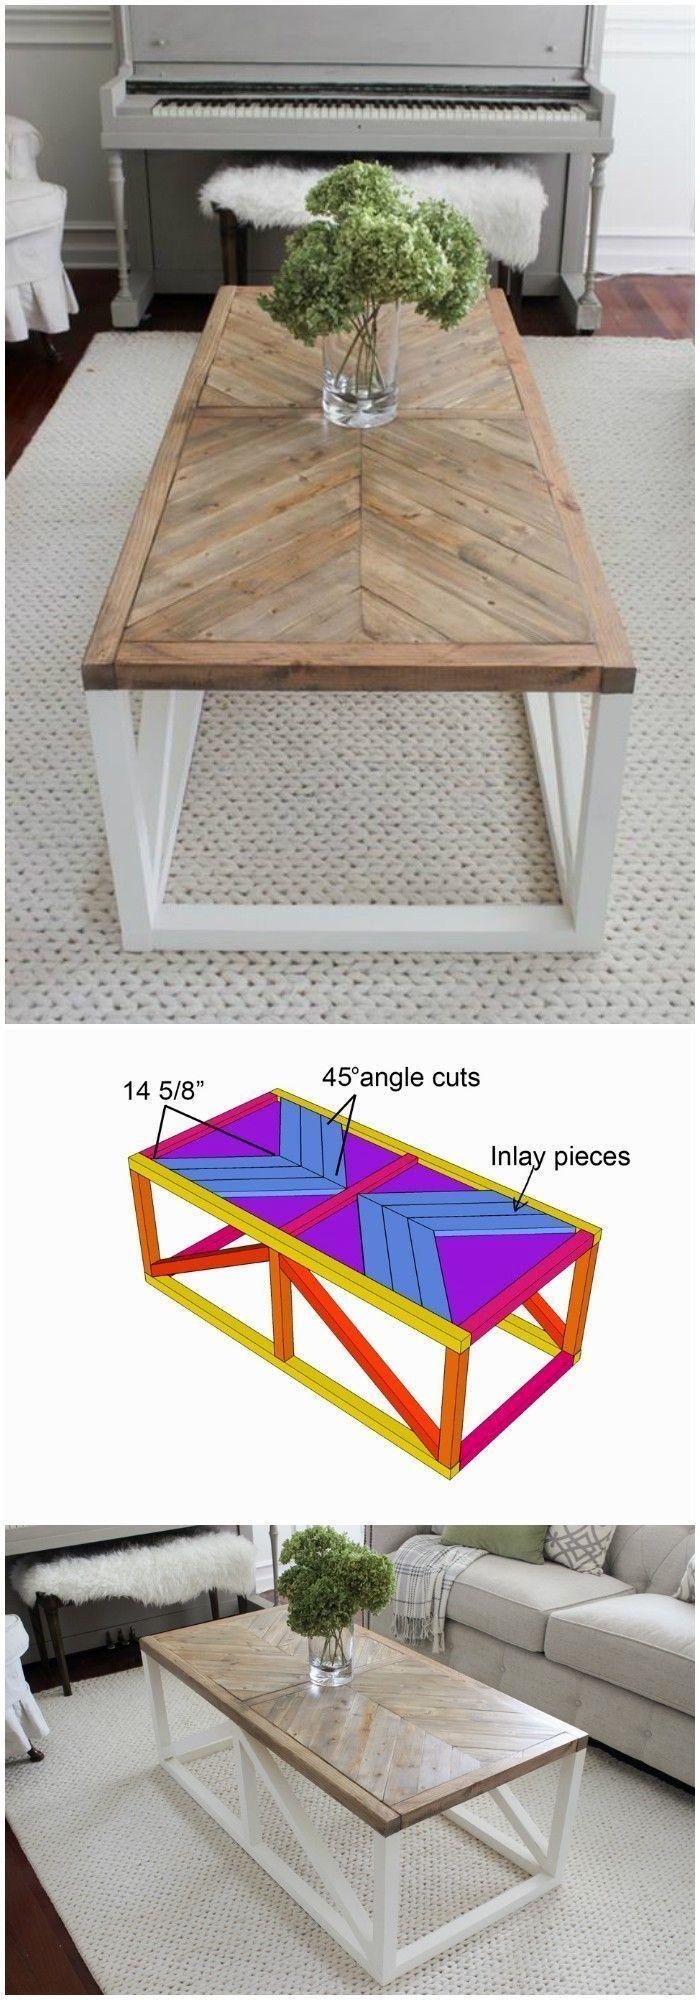 Easy Diy Coffee Table In 2020 Modern Farmhouse Coffee Table Diy Farmhouse Coffee Table Coffee Table Farmhouse [ 2000 x 700 Pixel ]